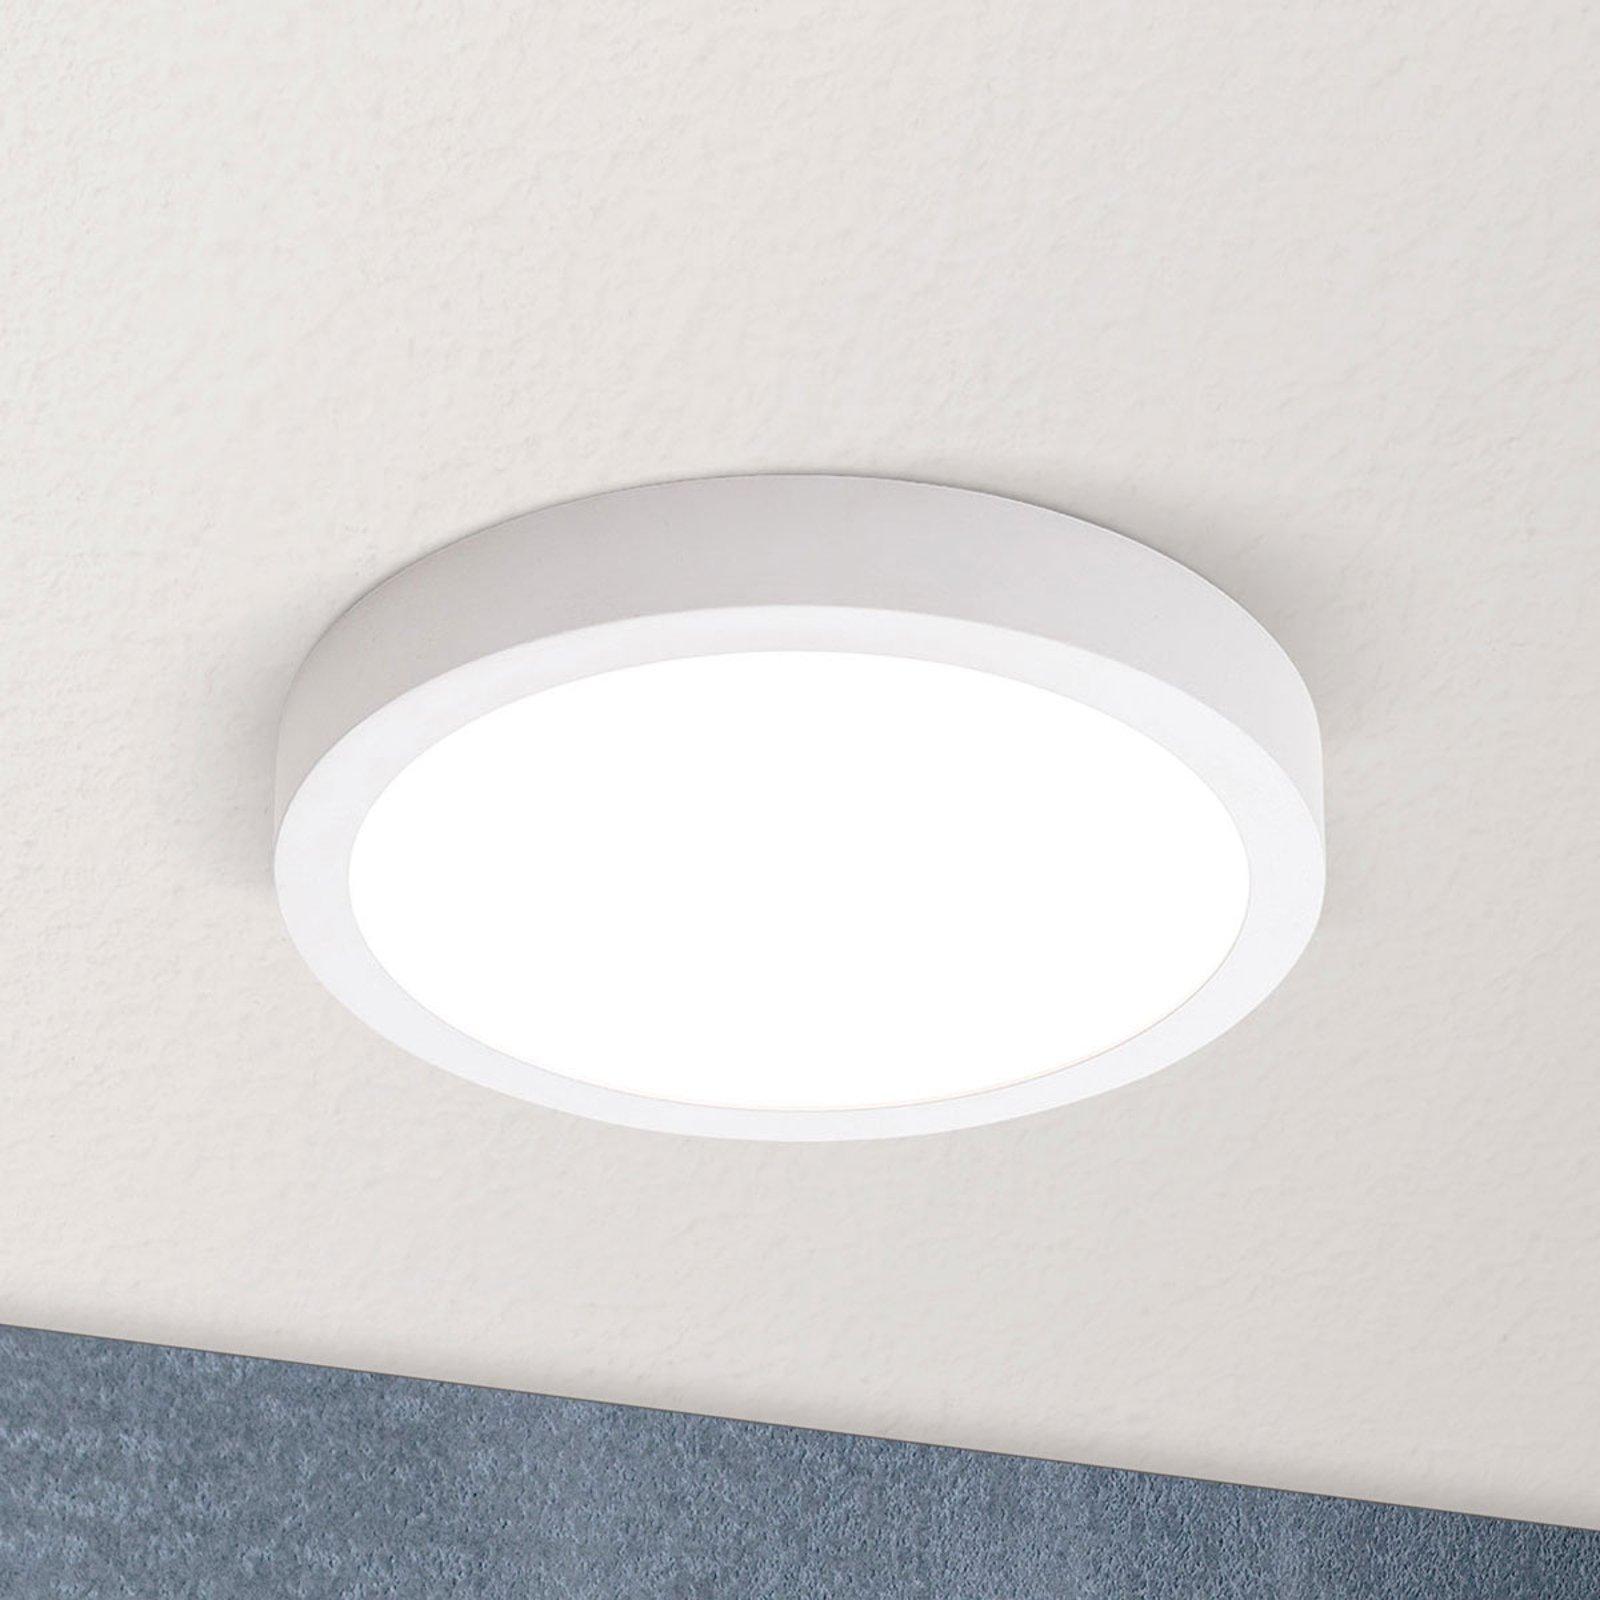 LED-taklampe Vika, rund, hvit, Ø 18cm